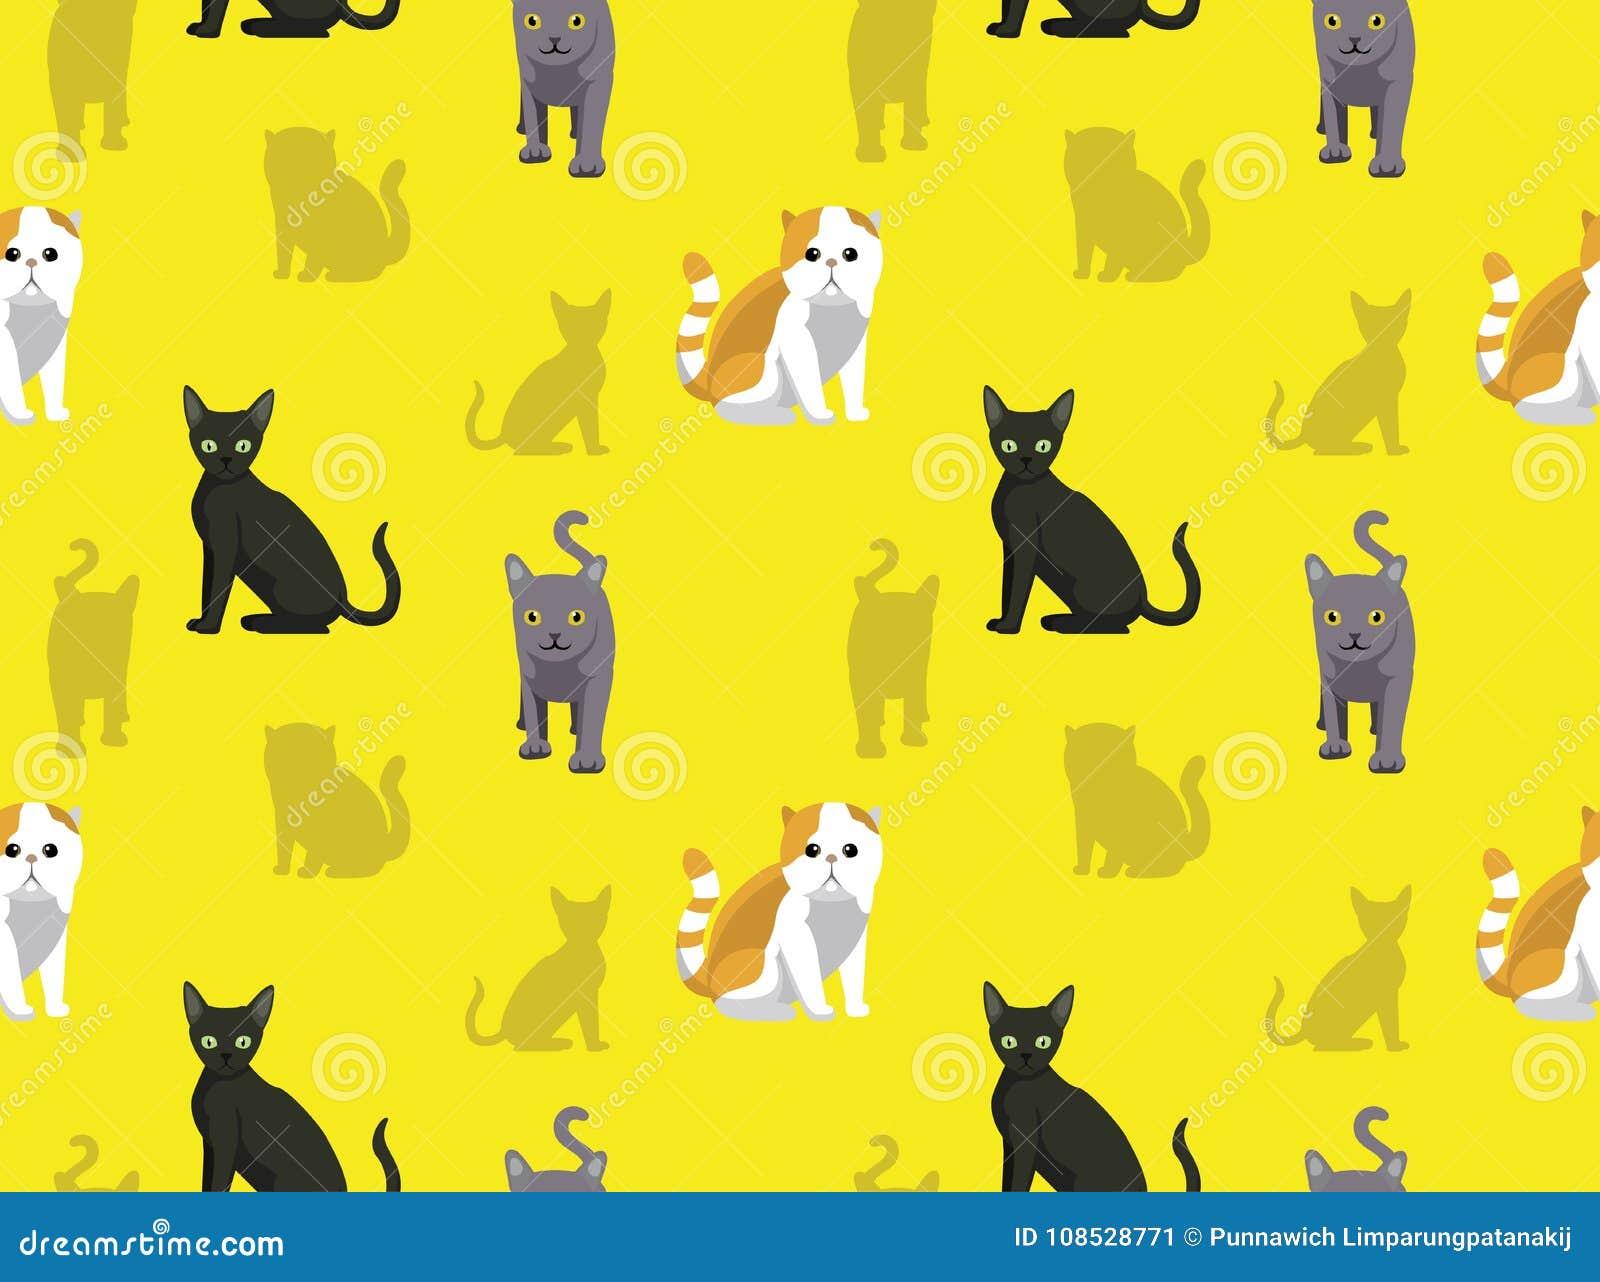 Cat Wallpaper 8 Stock Vector Illustration Of Domestic 108528771